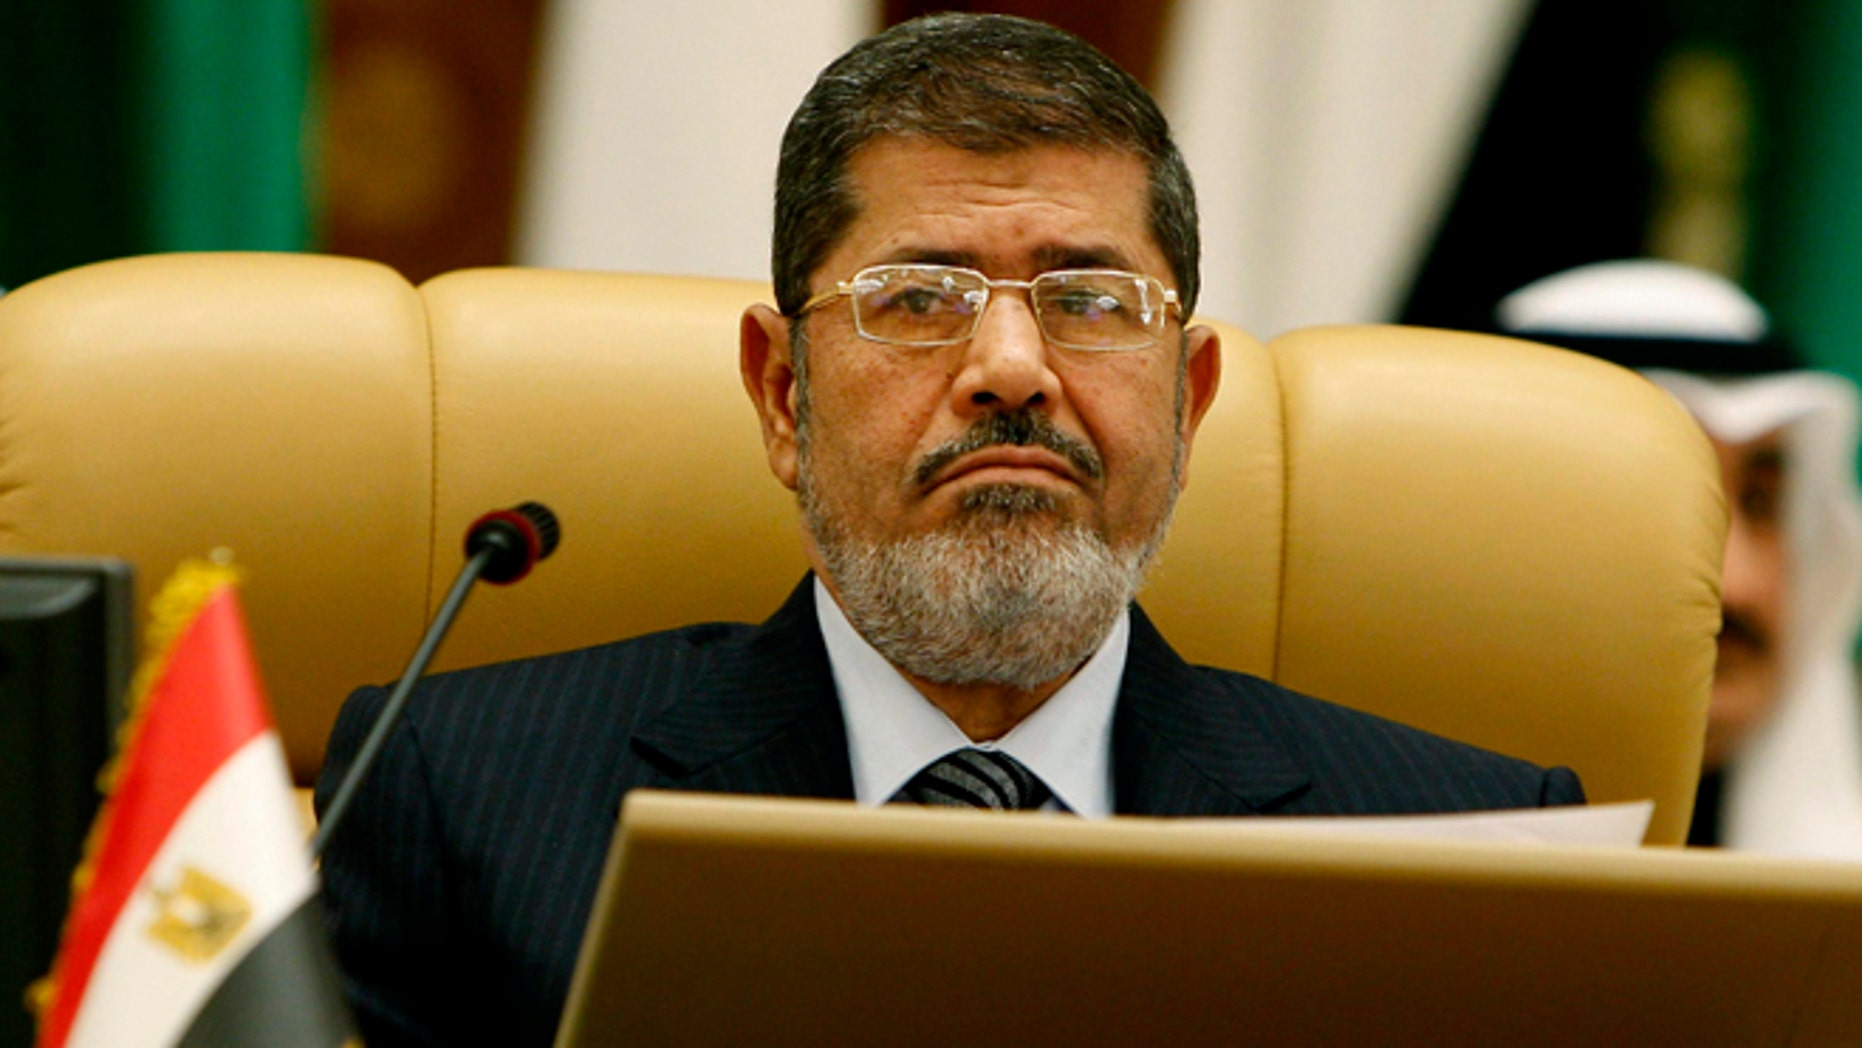 Jan. 21, 2013: Egyptian President Mohammed Morsi attends the third session of the Arab Economic Summit, in Riyadh, Saudi Arabia.